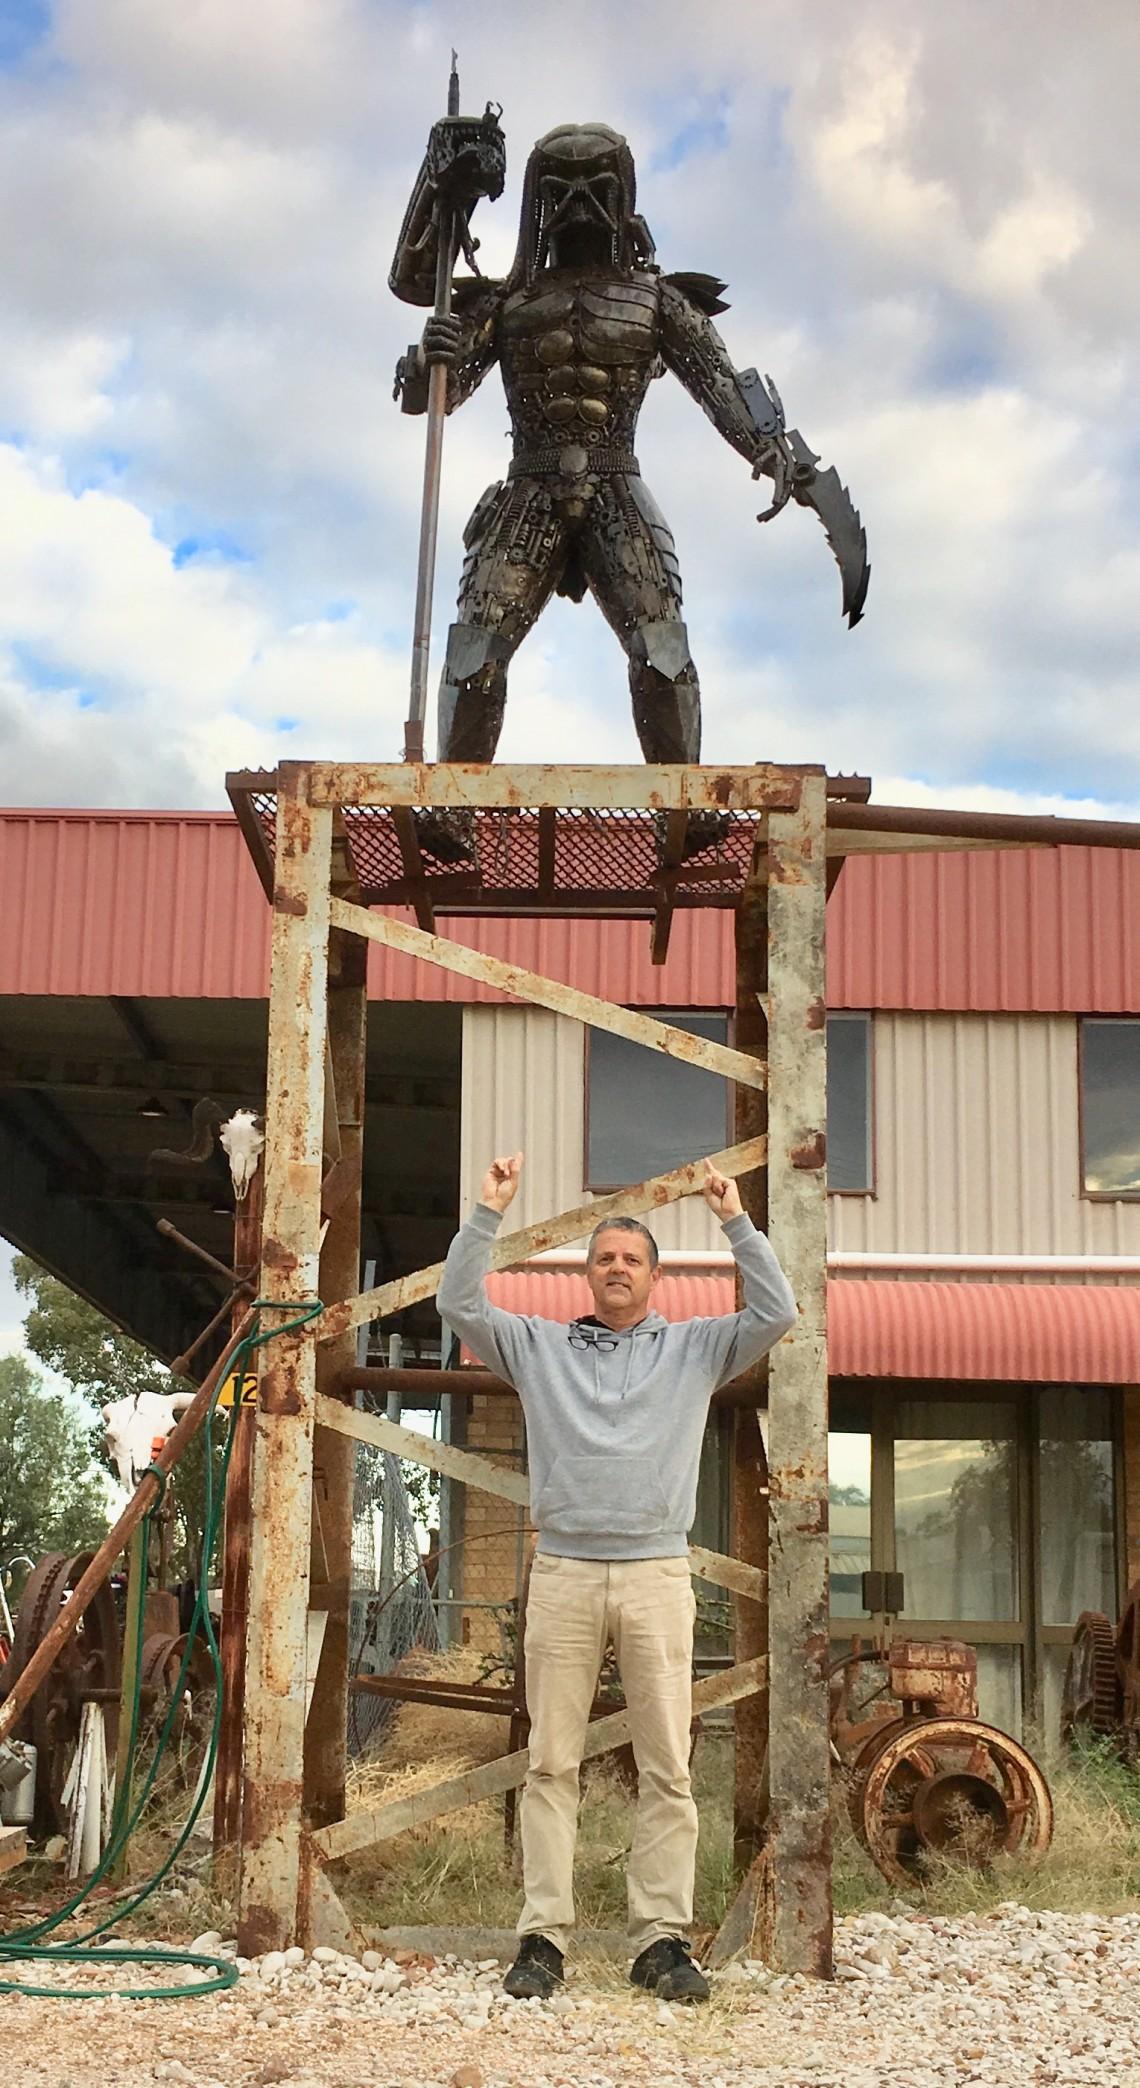 Predator memorabilia Lightning Ridge opal mining town